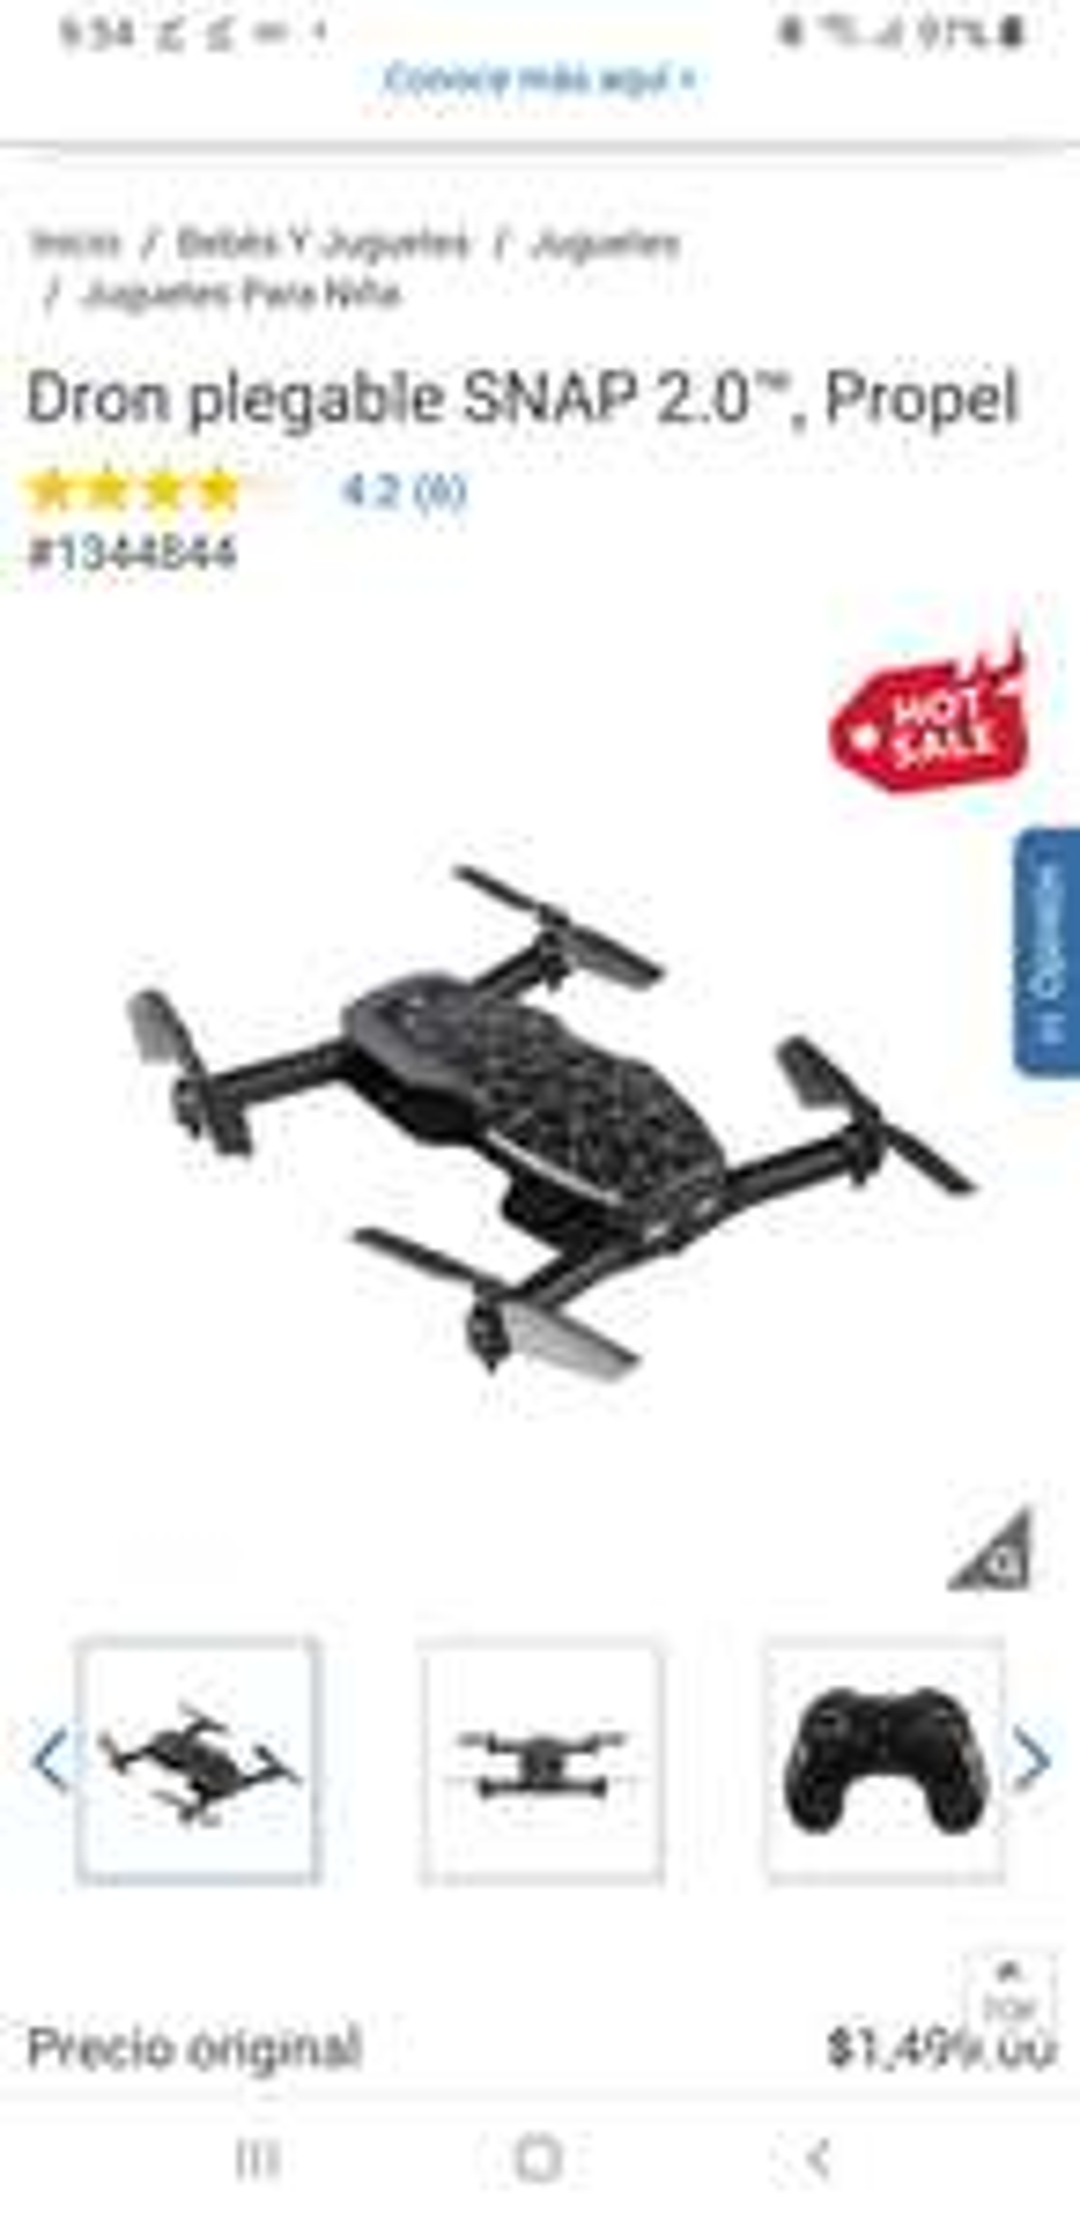 Costco: Dron plegable SNAP 2.0™, Propel